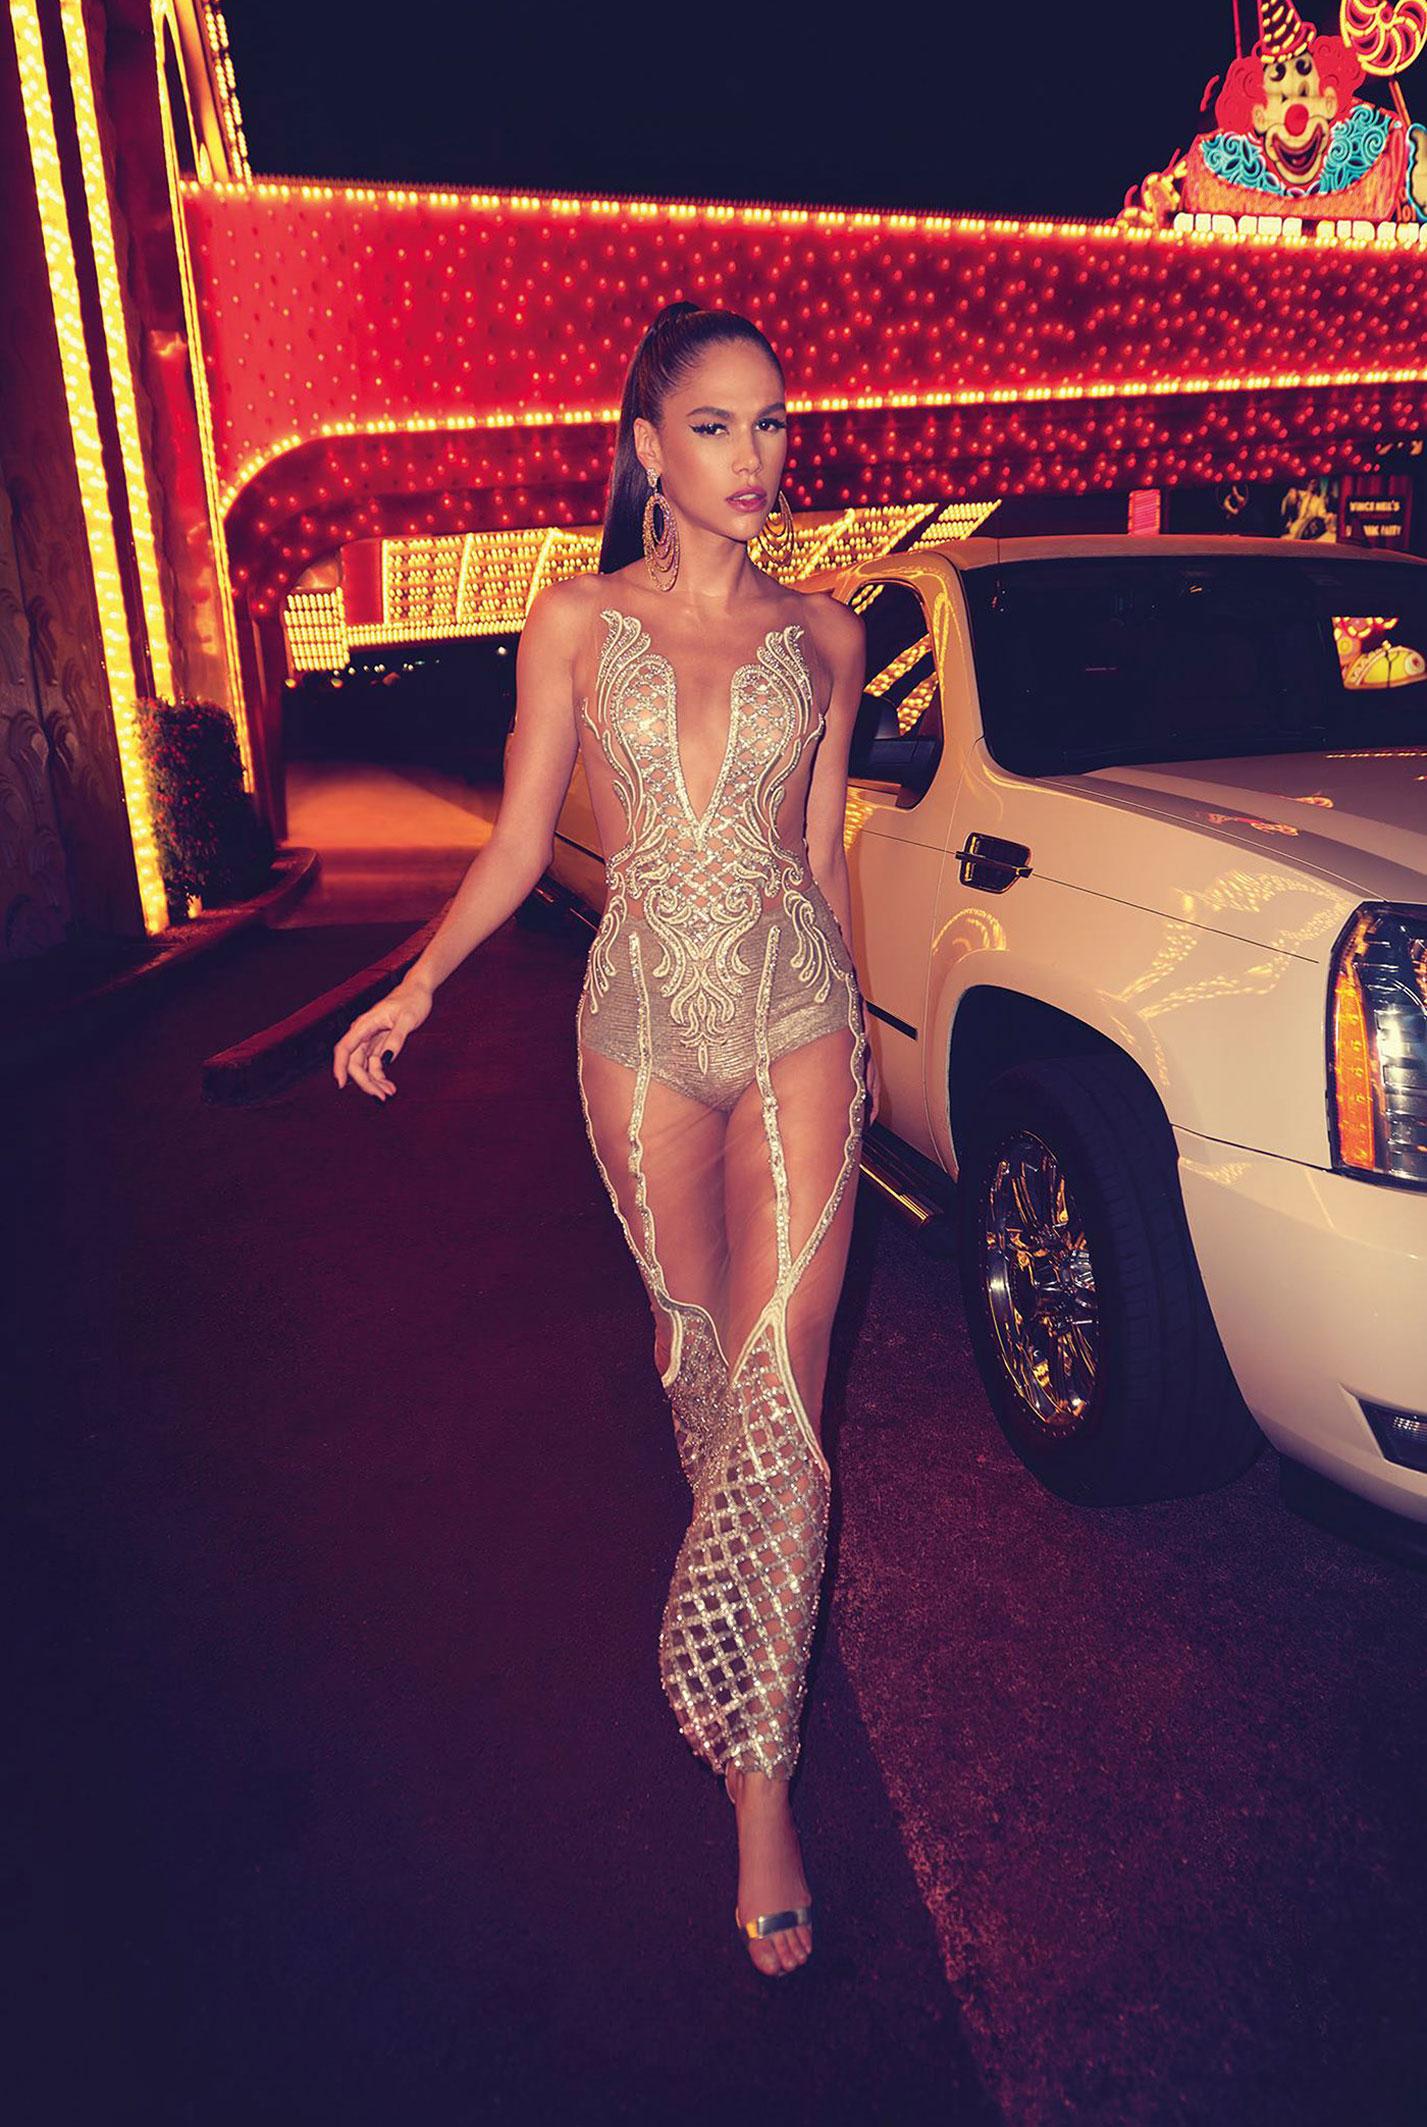 Даниэлла Понтес на вечеринке в Лас-Вегасе / фото 18